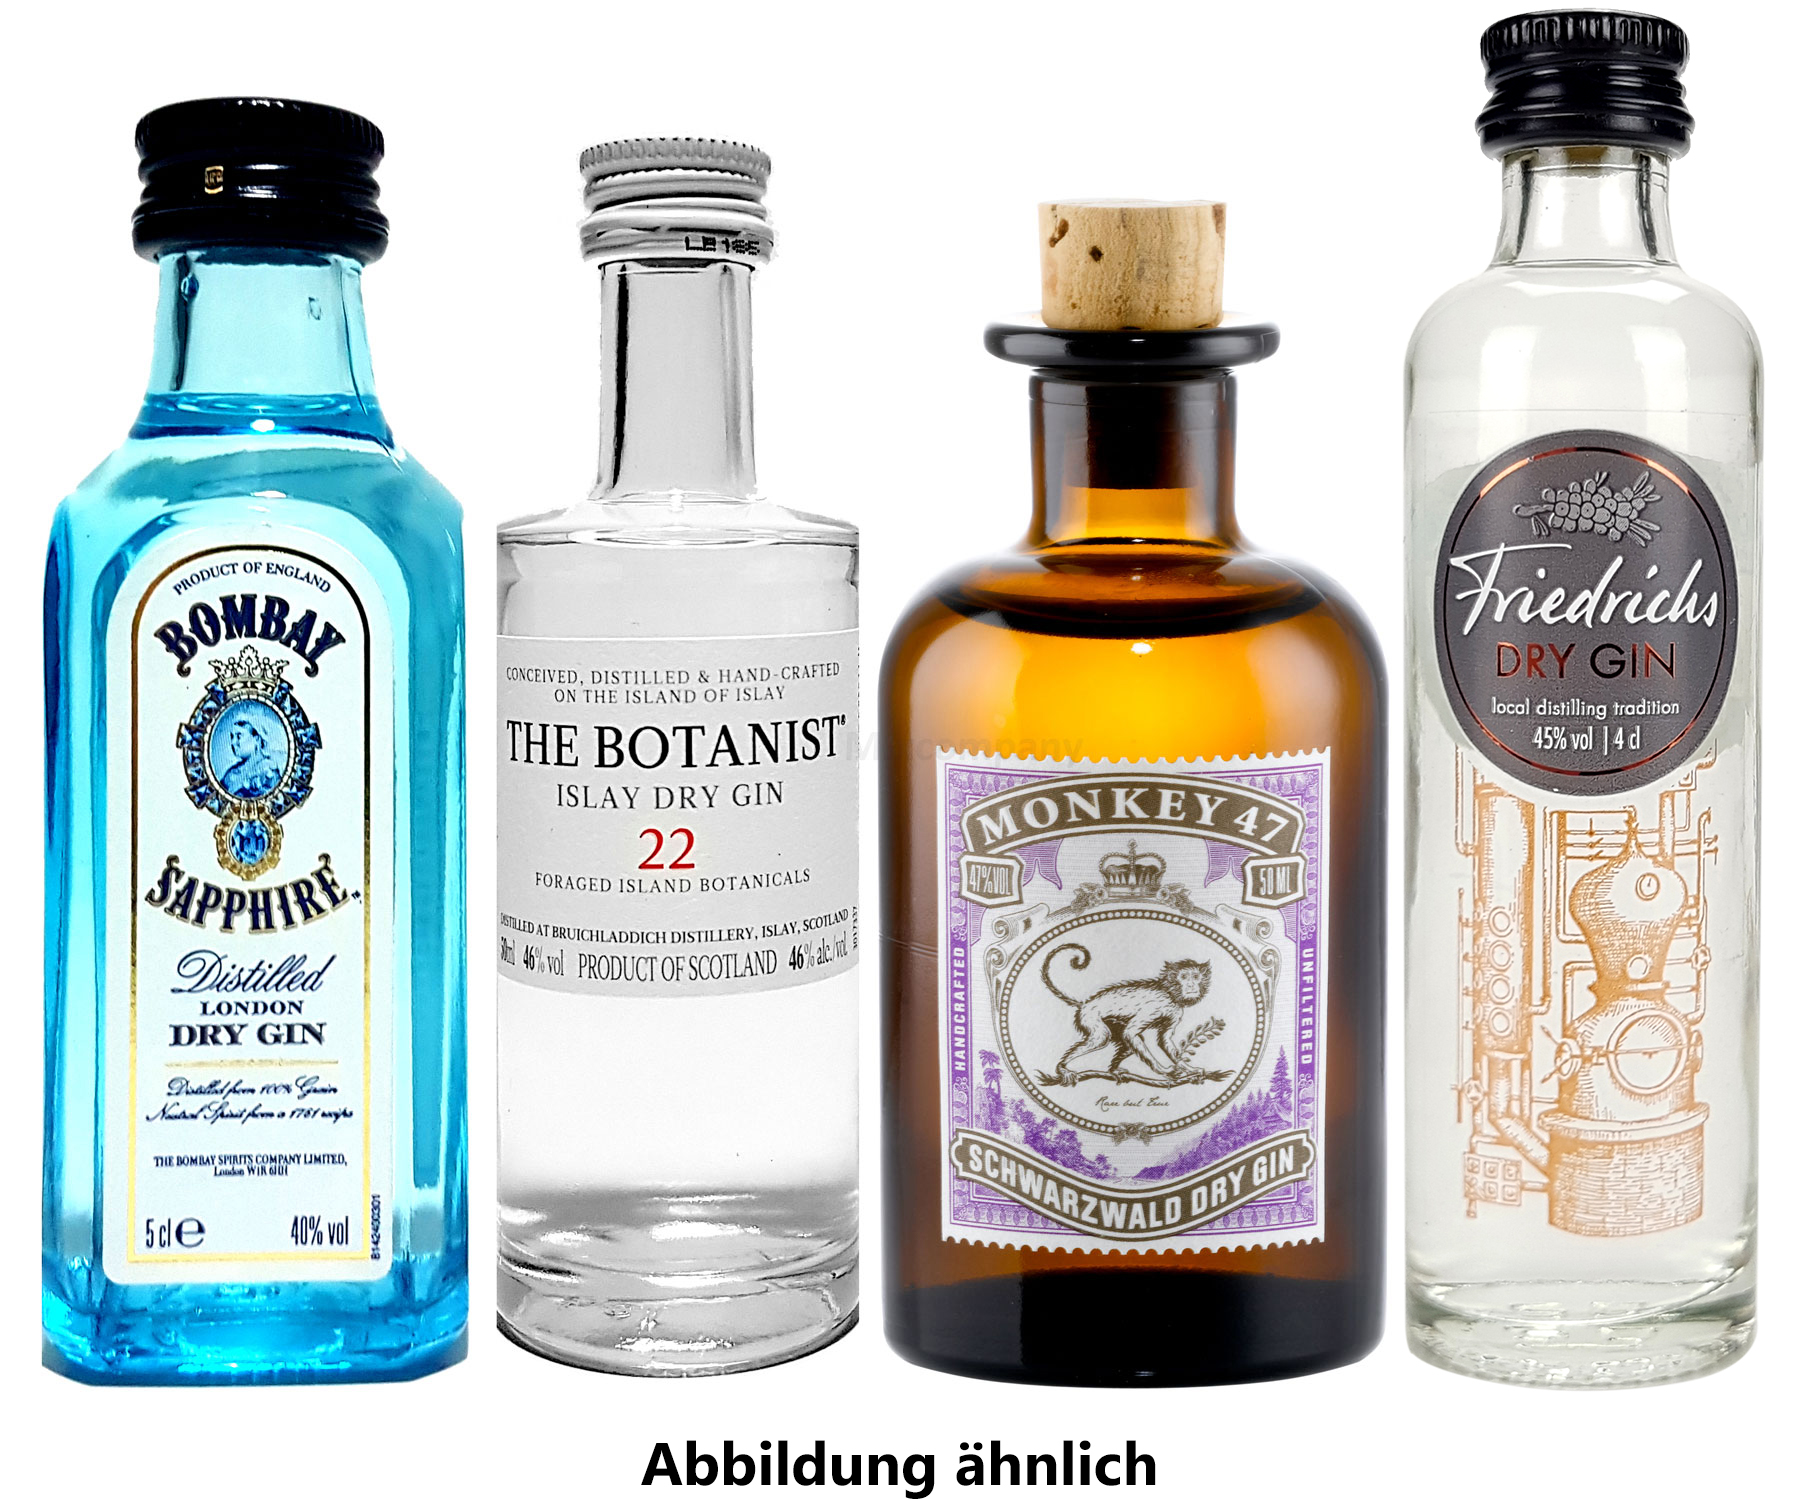 Gin mini 4er Set - Bombay Sapphire London Dry Gin 50ml (40% Vol) + Monkey 47 Schwarzwald Dry Gin 50ml (47% Vol) + The Botanist Islay Dry Gin 50ml (46% Vol) + Friedrichs Dry Gin 4cl (45% Vol)